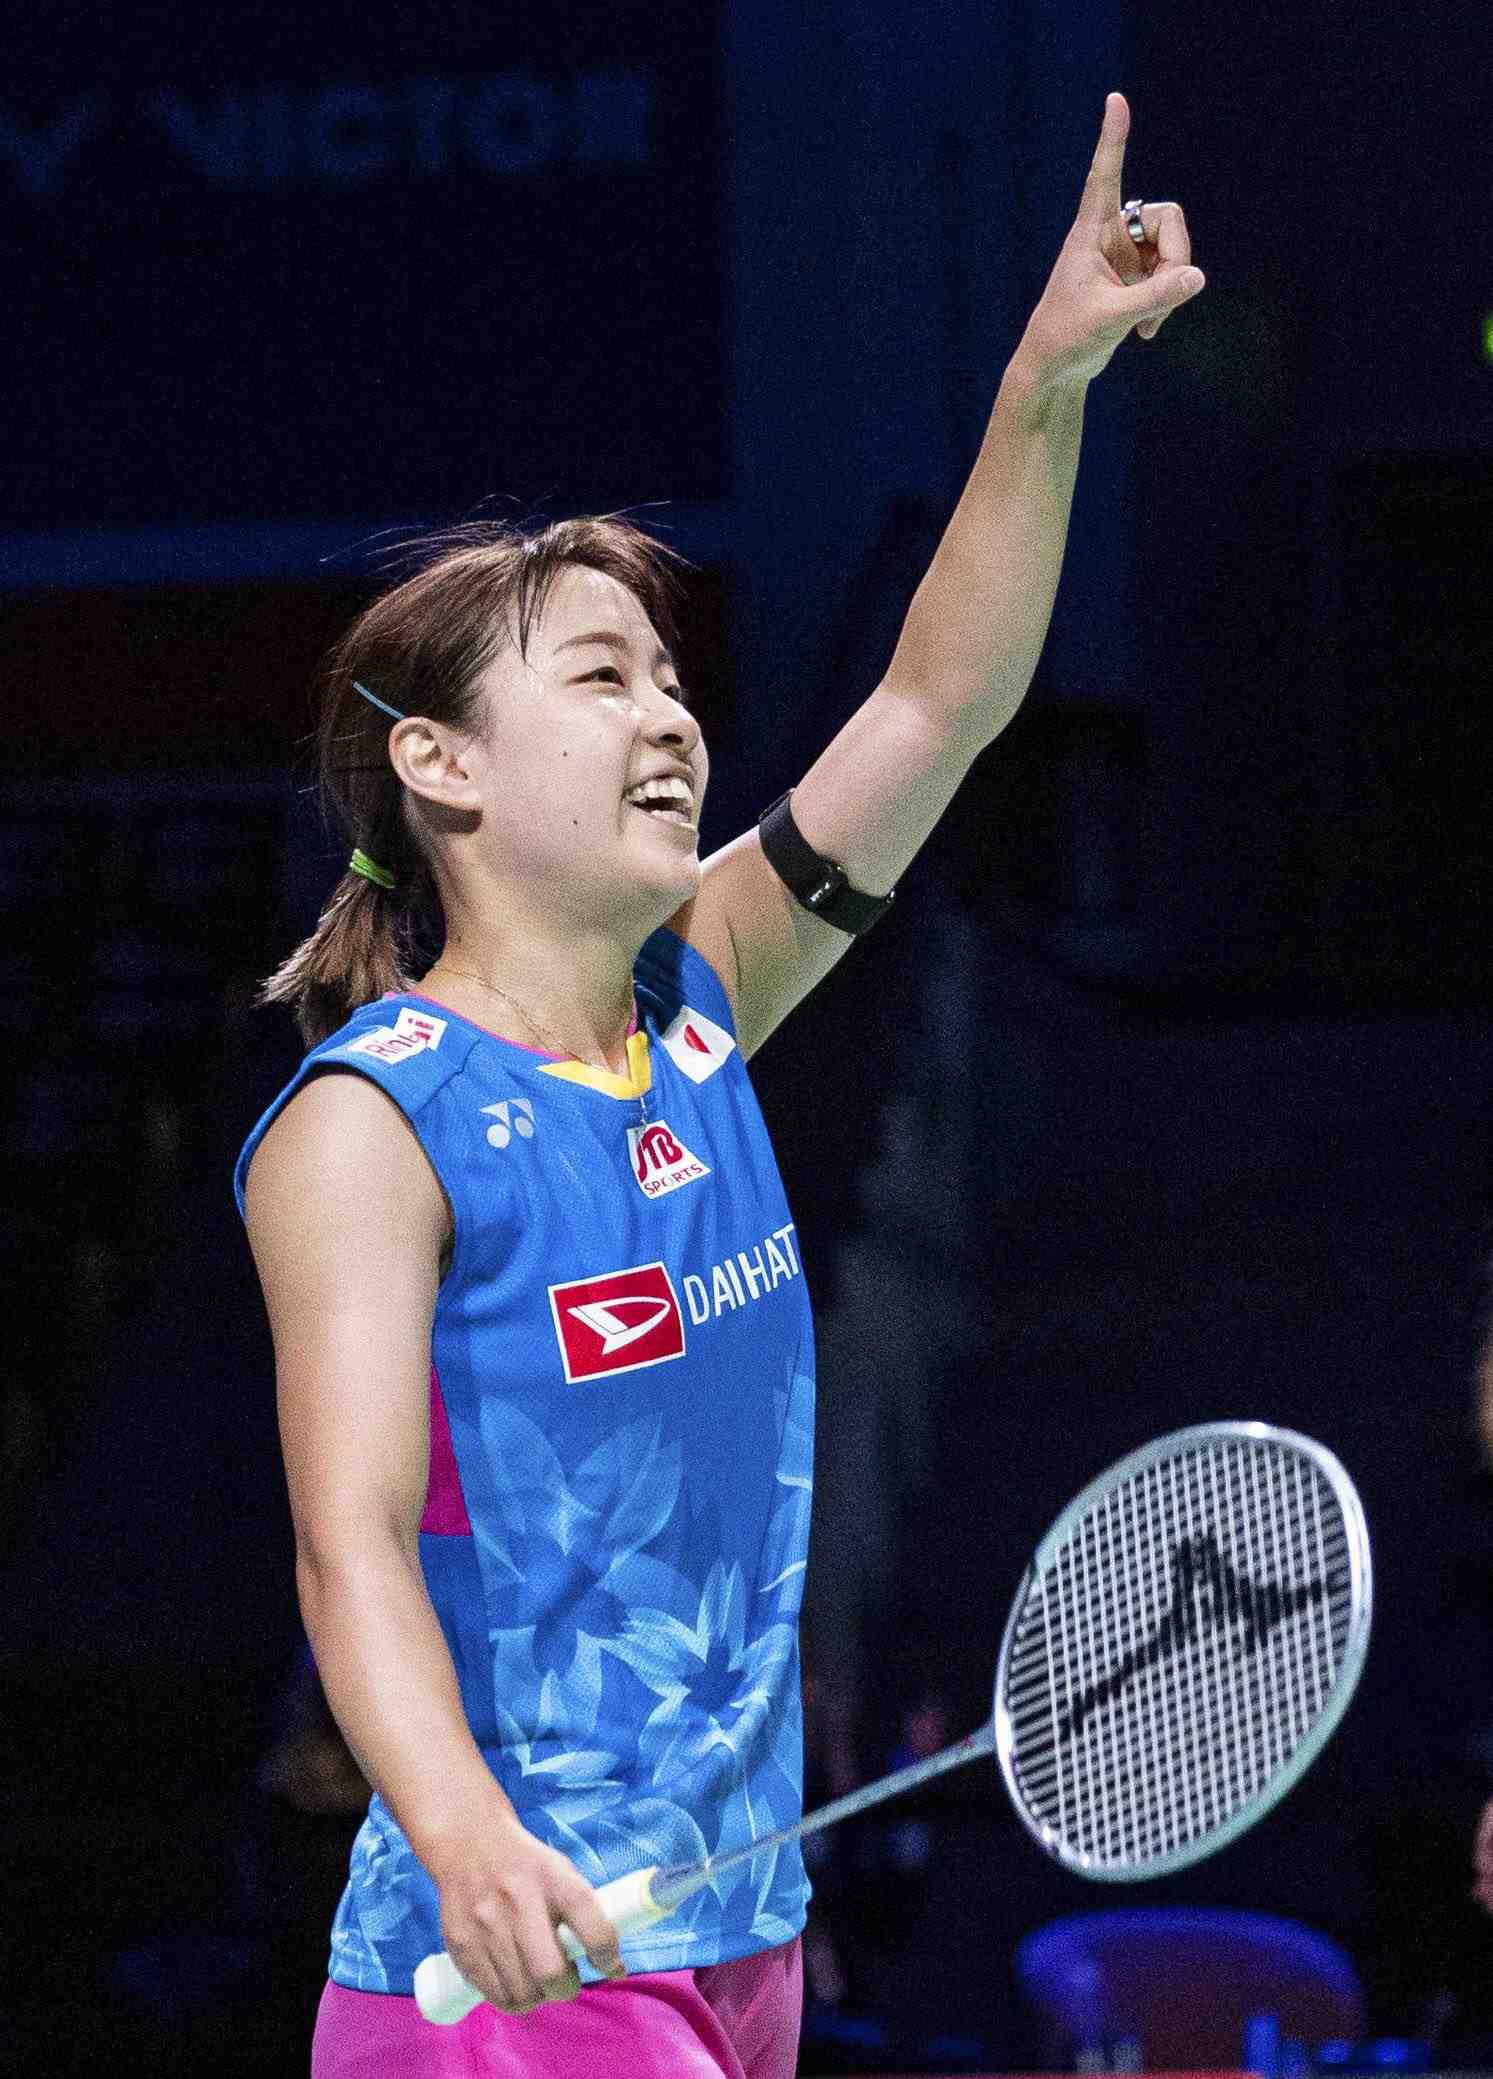 Badminton Nozomi Okuhara was the winner of the Denmark Open 002